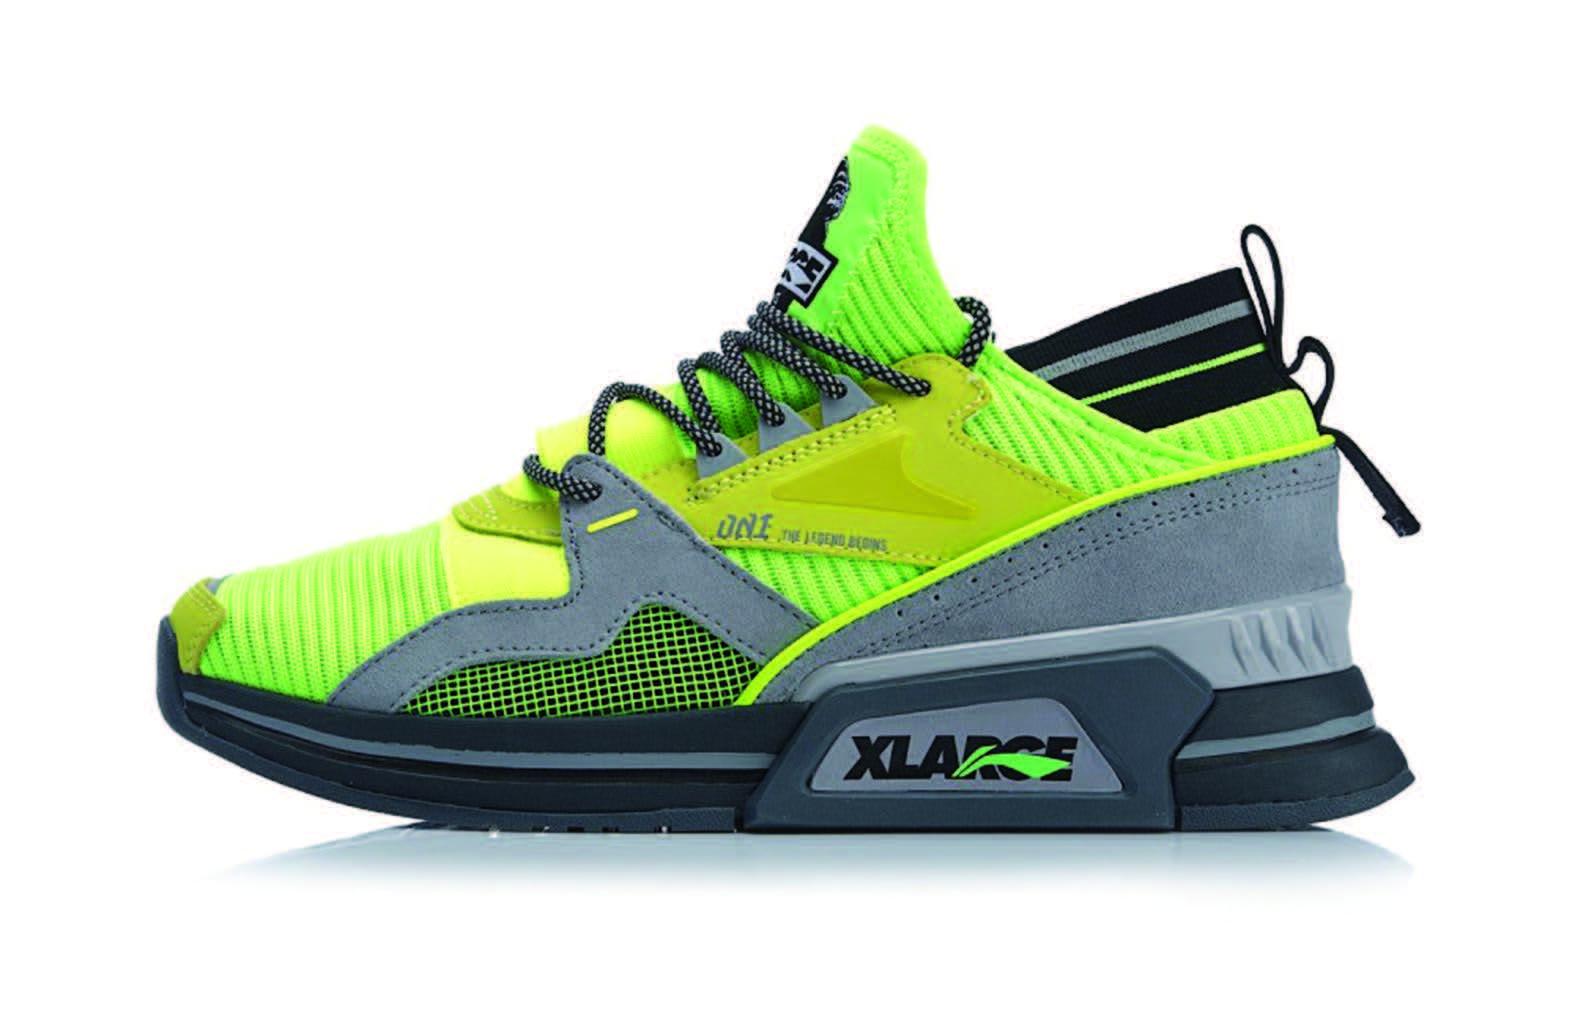 X-LARGE X LI NING 001 T1000 - Sneakers Magazine